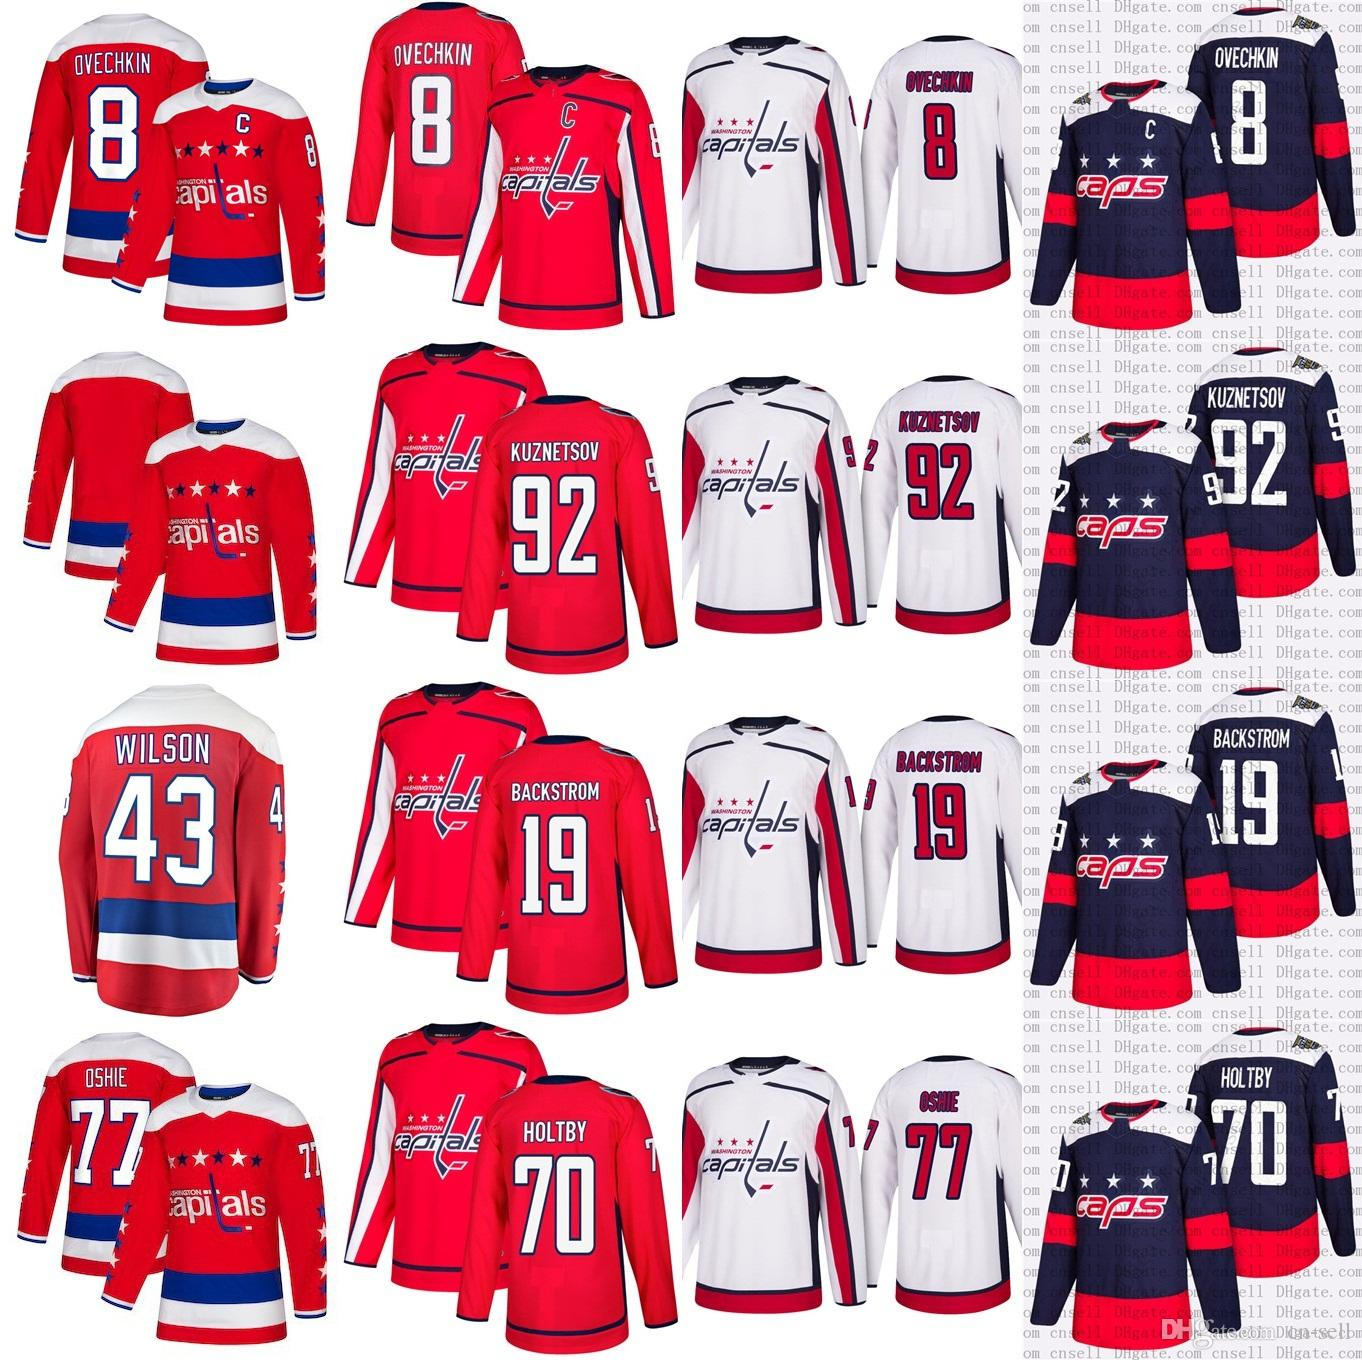 2019 2019 New Alternative Washington Capitals Alex Ovechkin TJ Oshie 70  Braden Holtb Kuznetsov Tom Wilson Backstrom Stadium Series Hockey Jersey  From Cn ... a8478ddf5